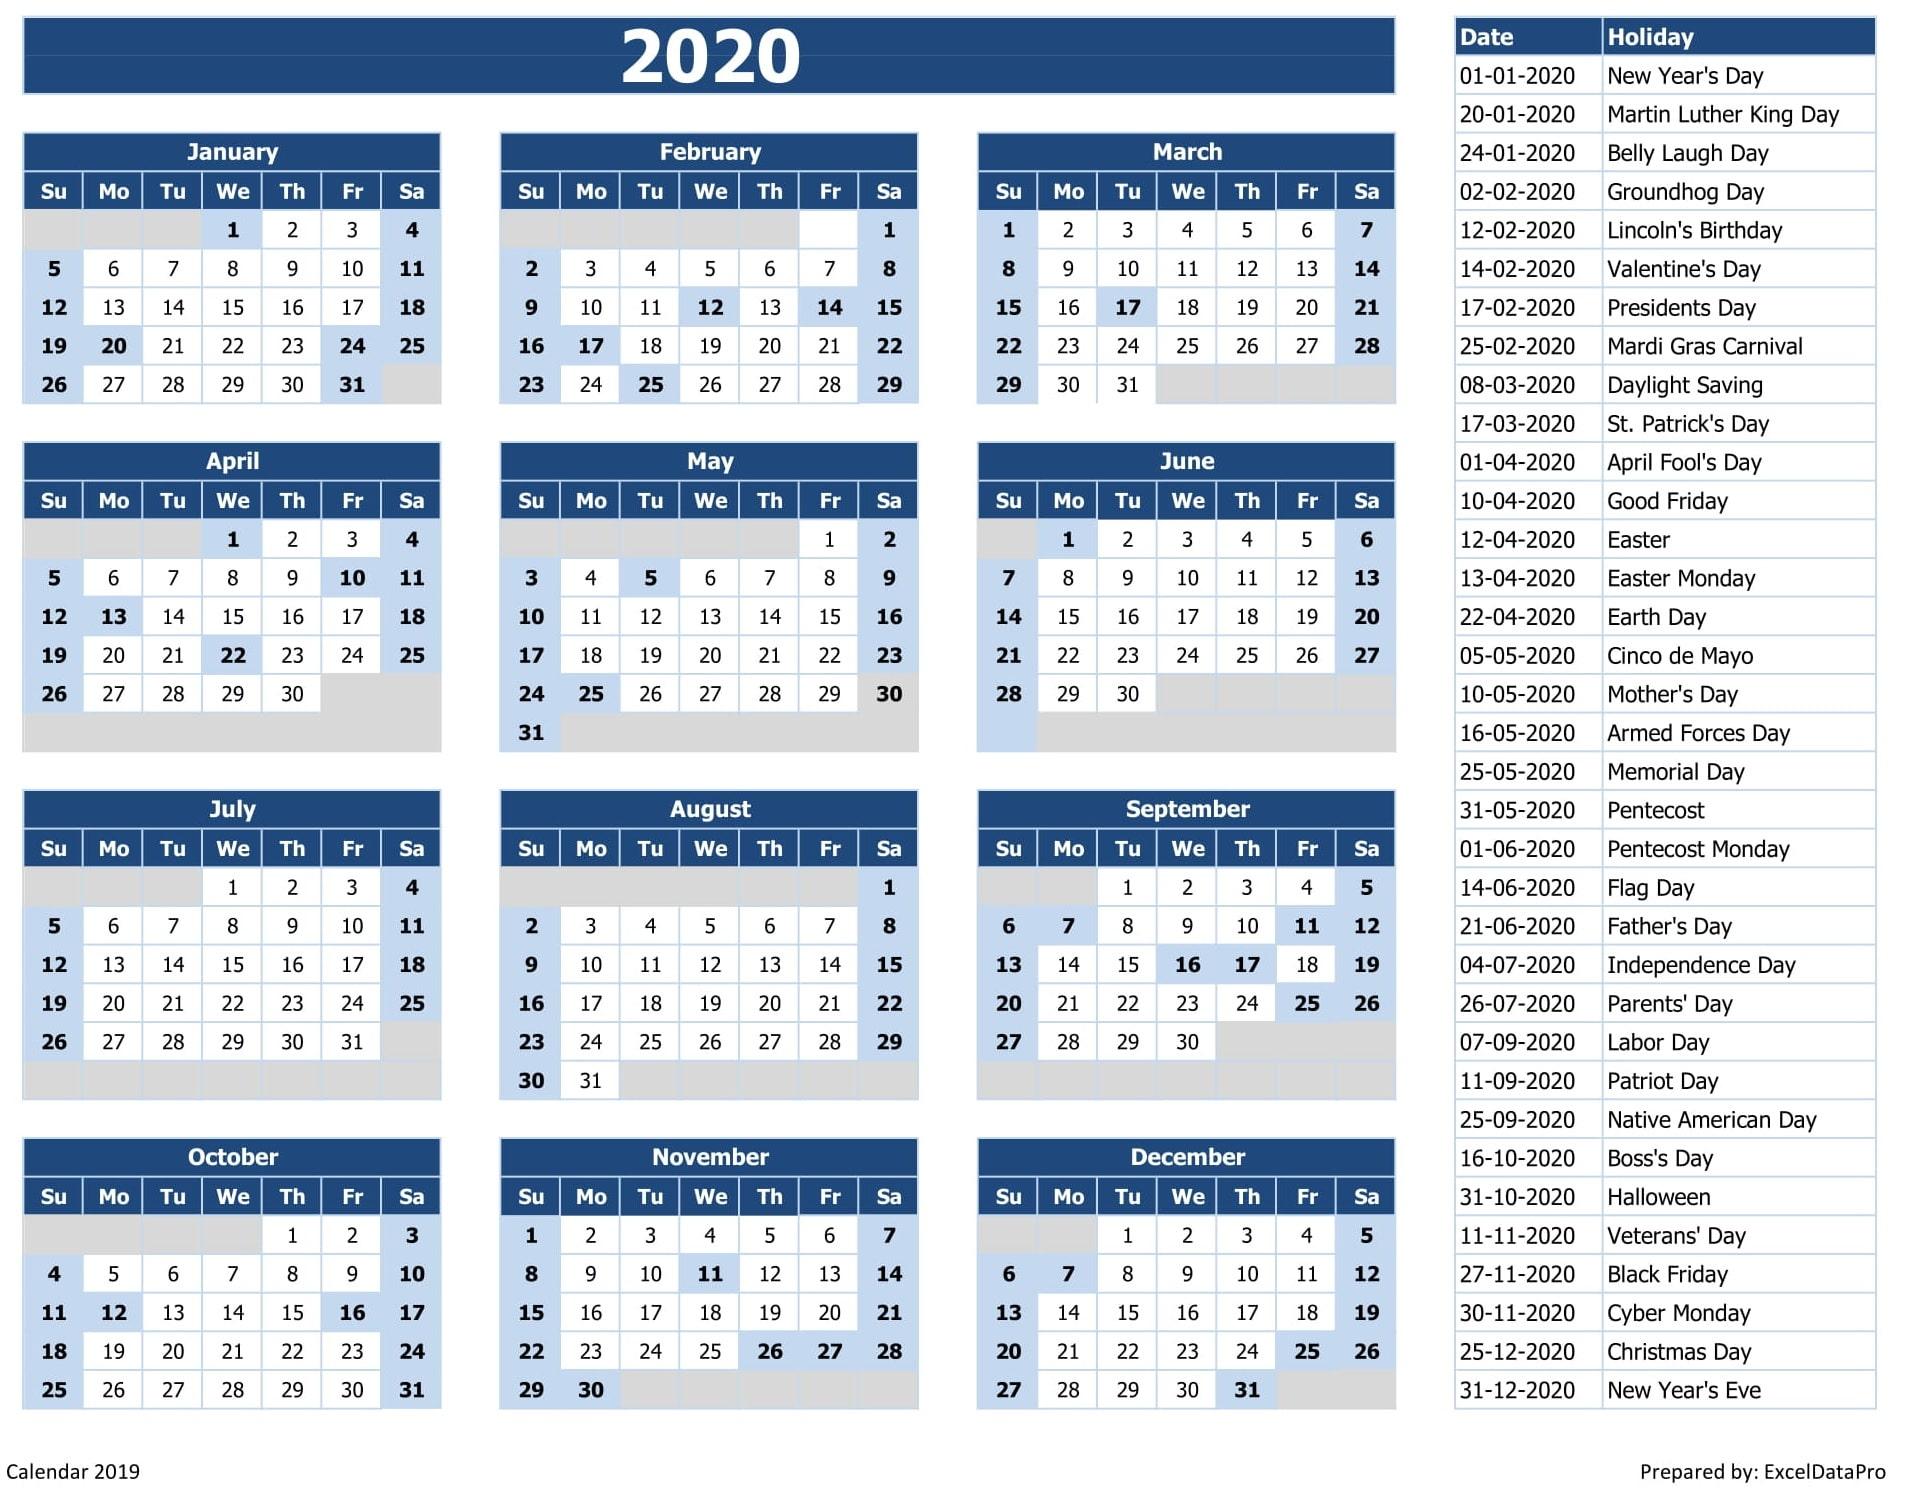 2020 Holiday List.2020 Holidays Kozen Jasonkellyphoto Co